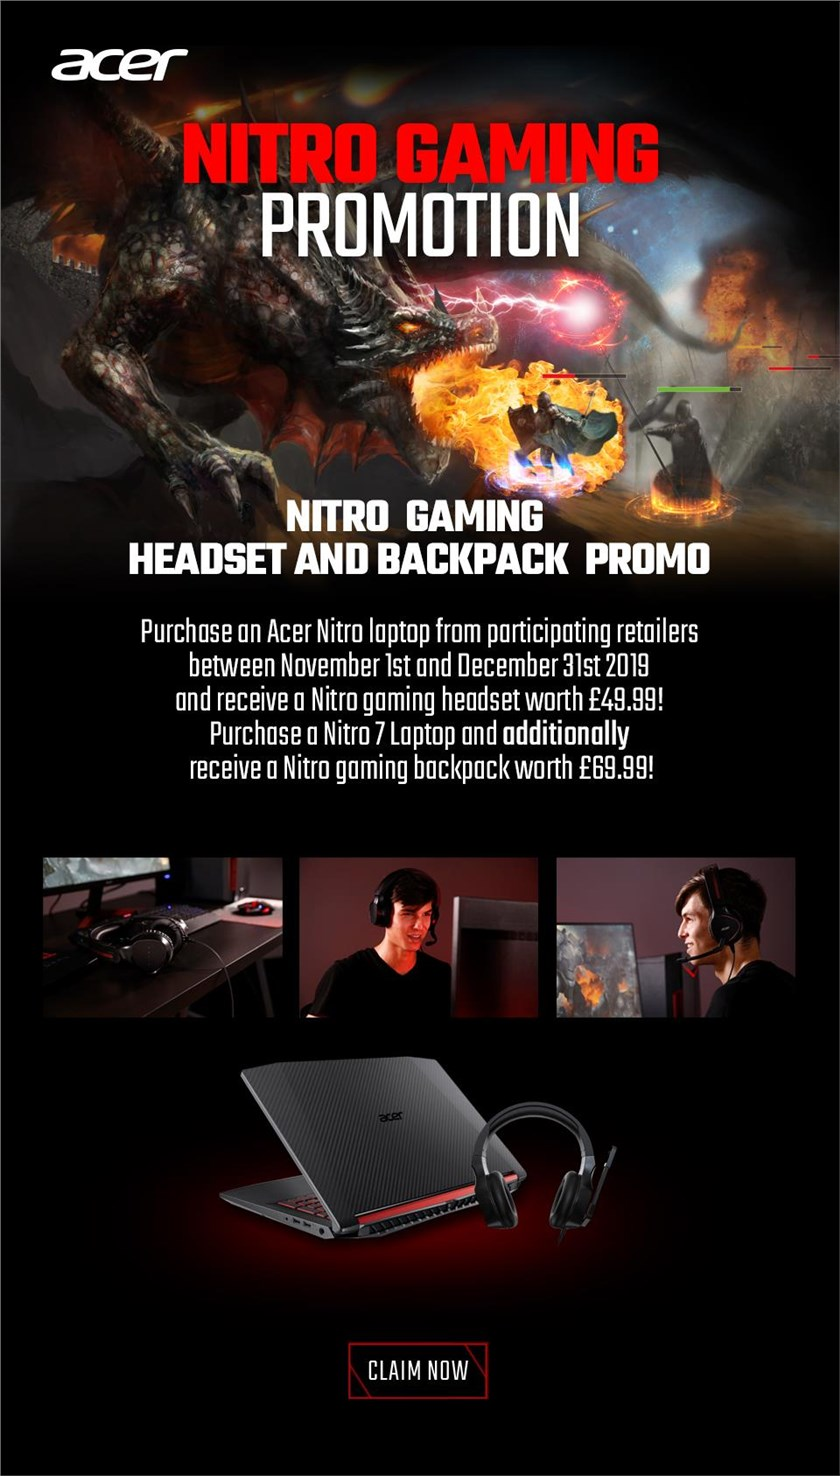 + Free Nitro Headset